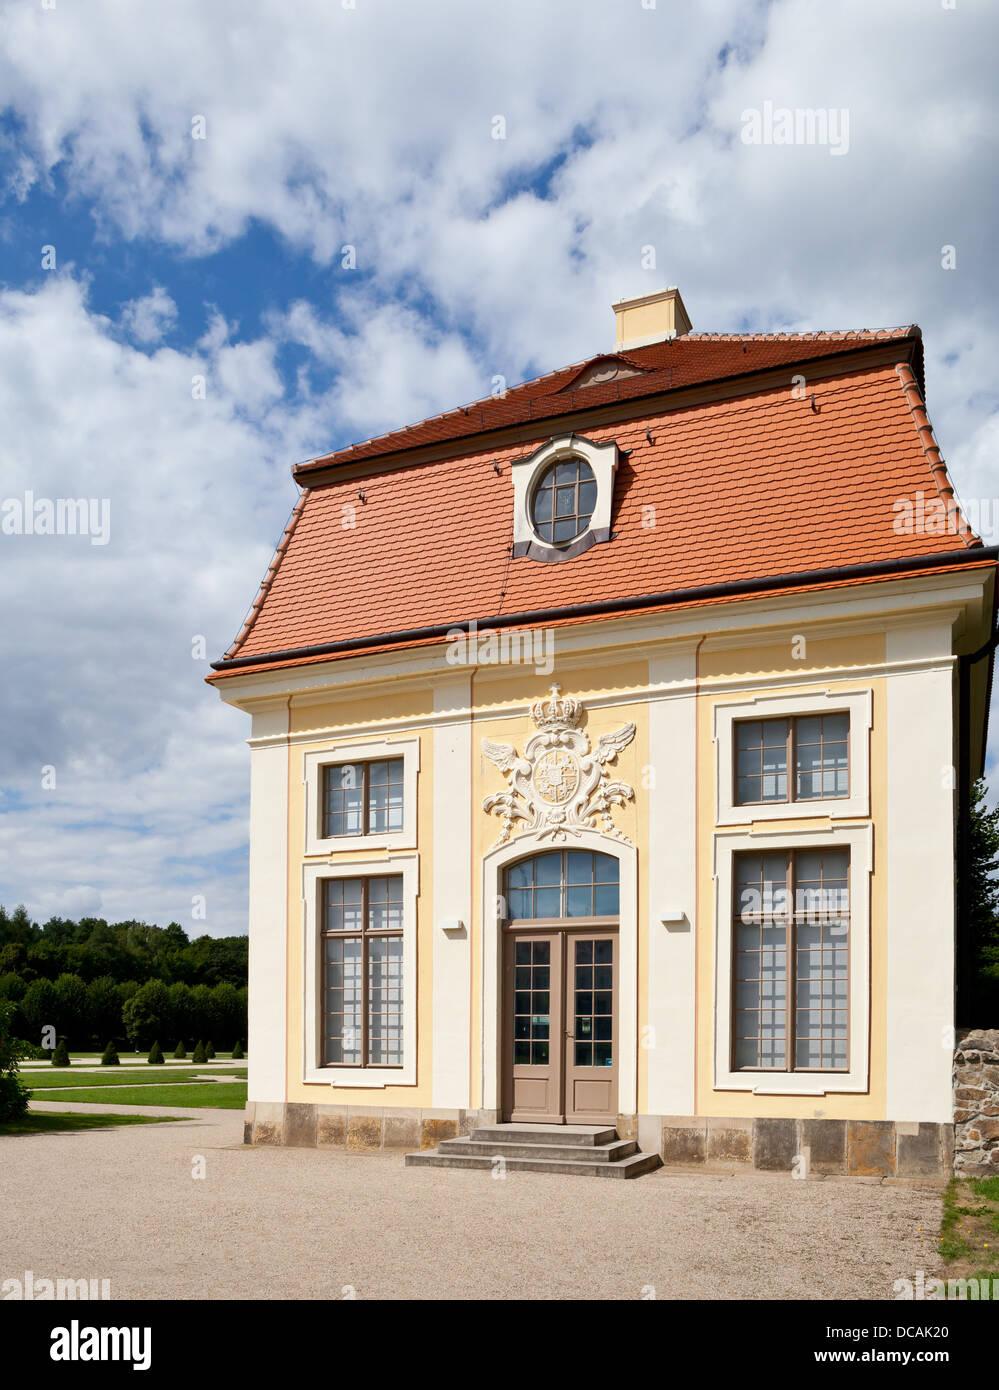 Cavalier's house (Kavaliershaus) at the Moritzburg castle - Saxonia, Germany, Europe Stock Photo